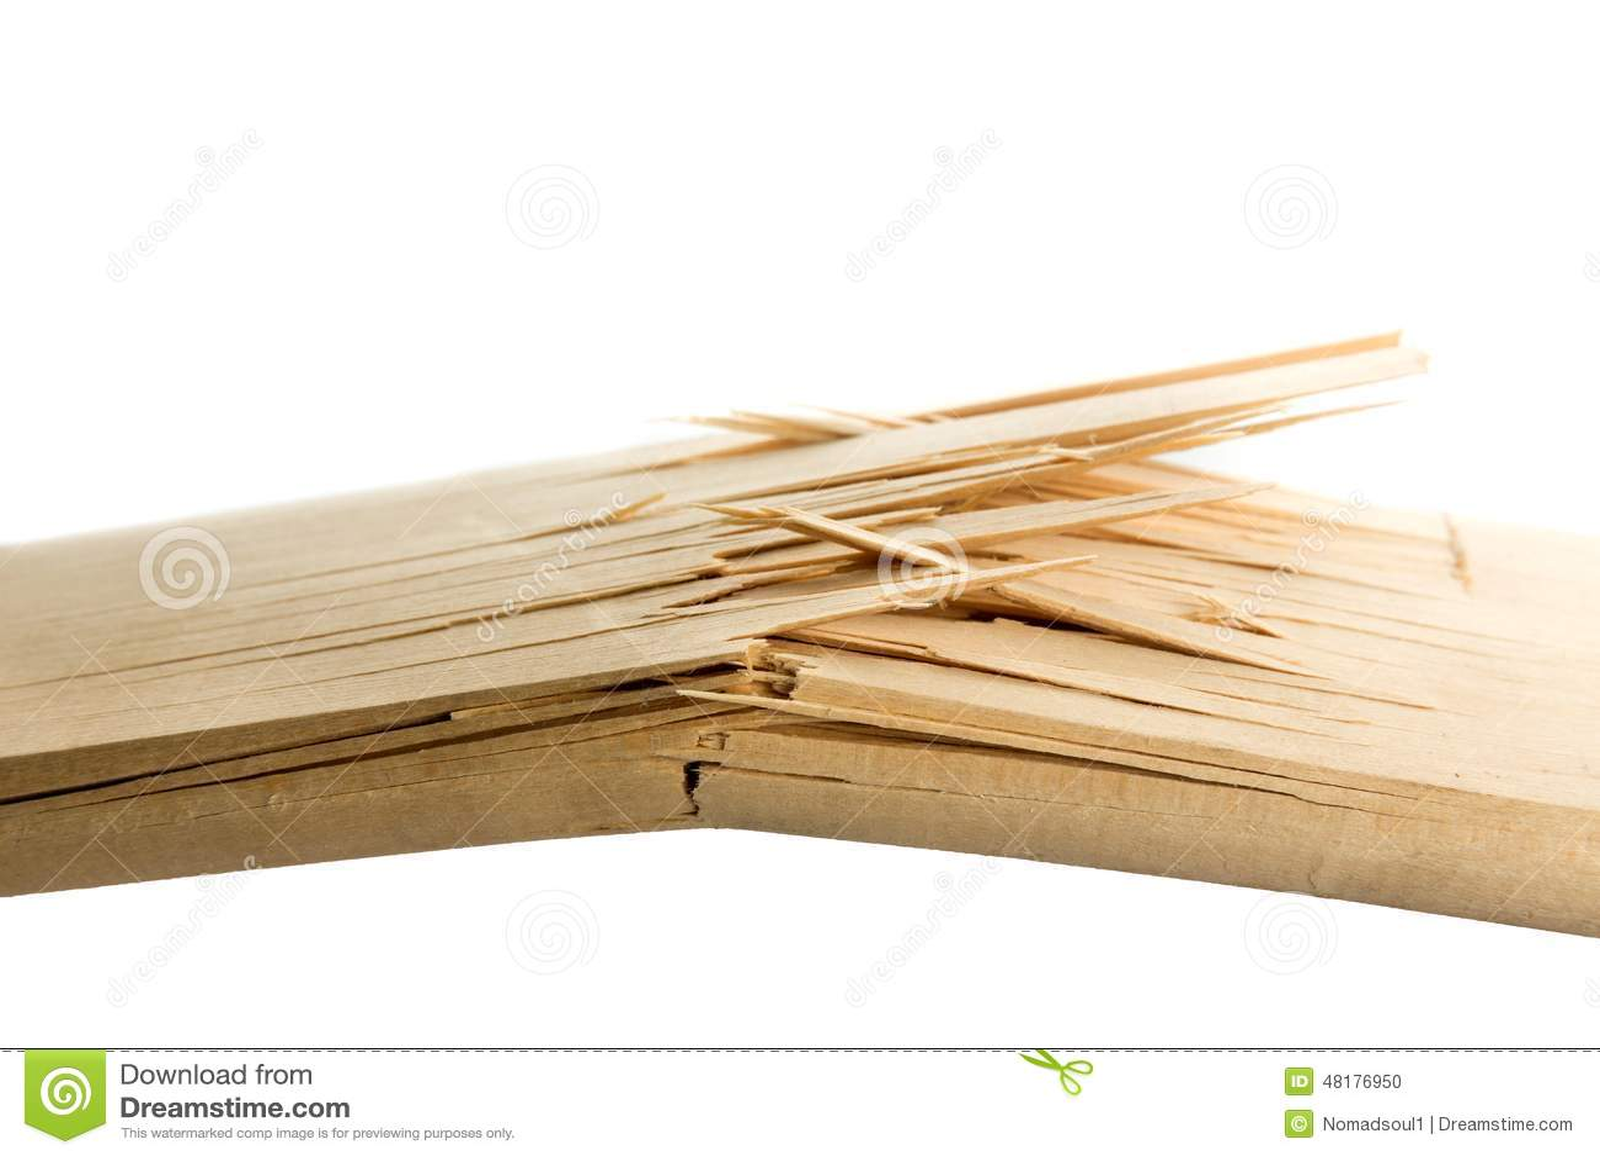 Broken wooden planks stock photo image of fragile shape